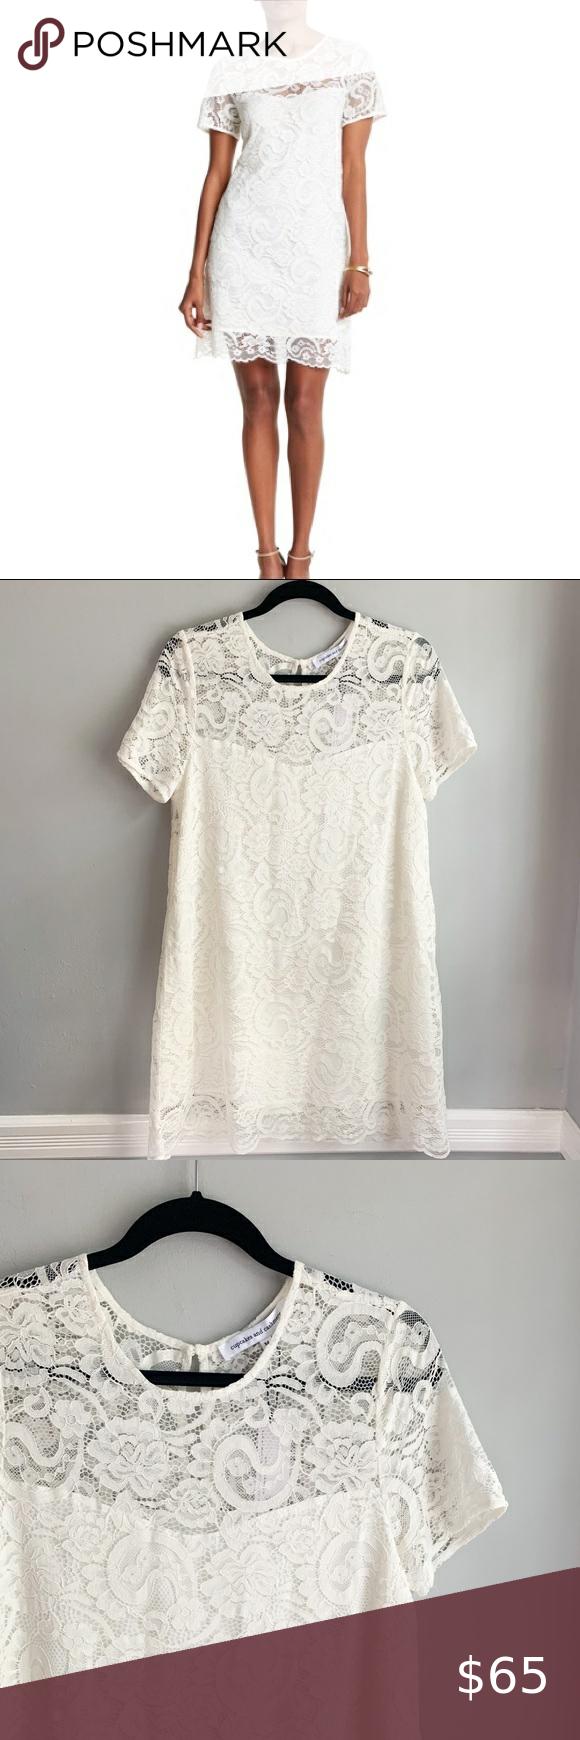 Nwt Cupcakes Cashmere White Lace Shift Dress White Lace Shift Dress Lace Shift Dress Lace Up Bodycon Dress [ 1740 x 580 Pixel ]